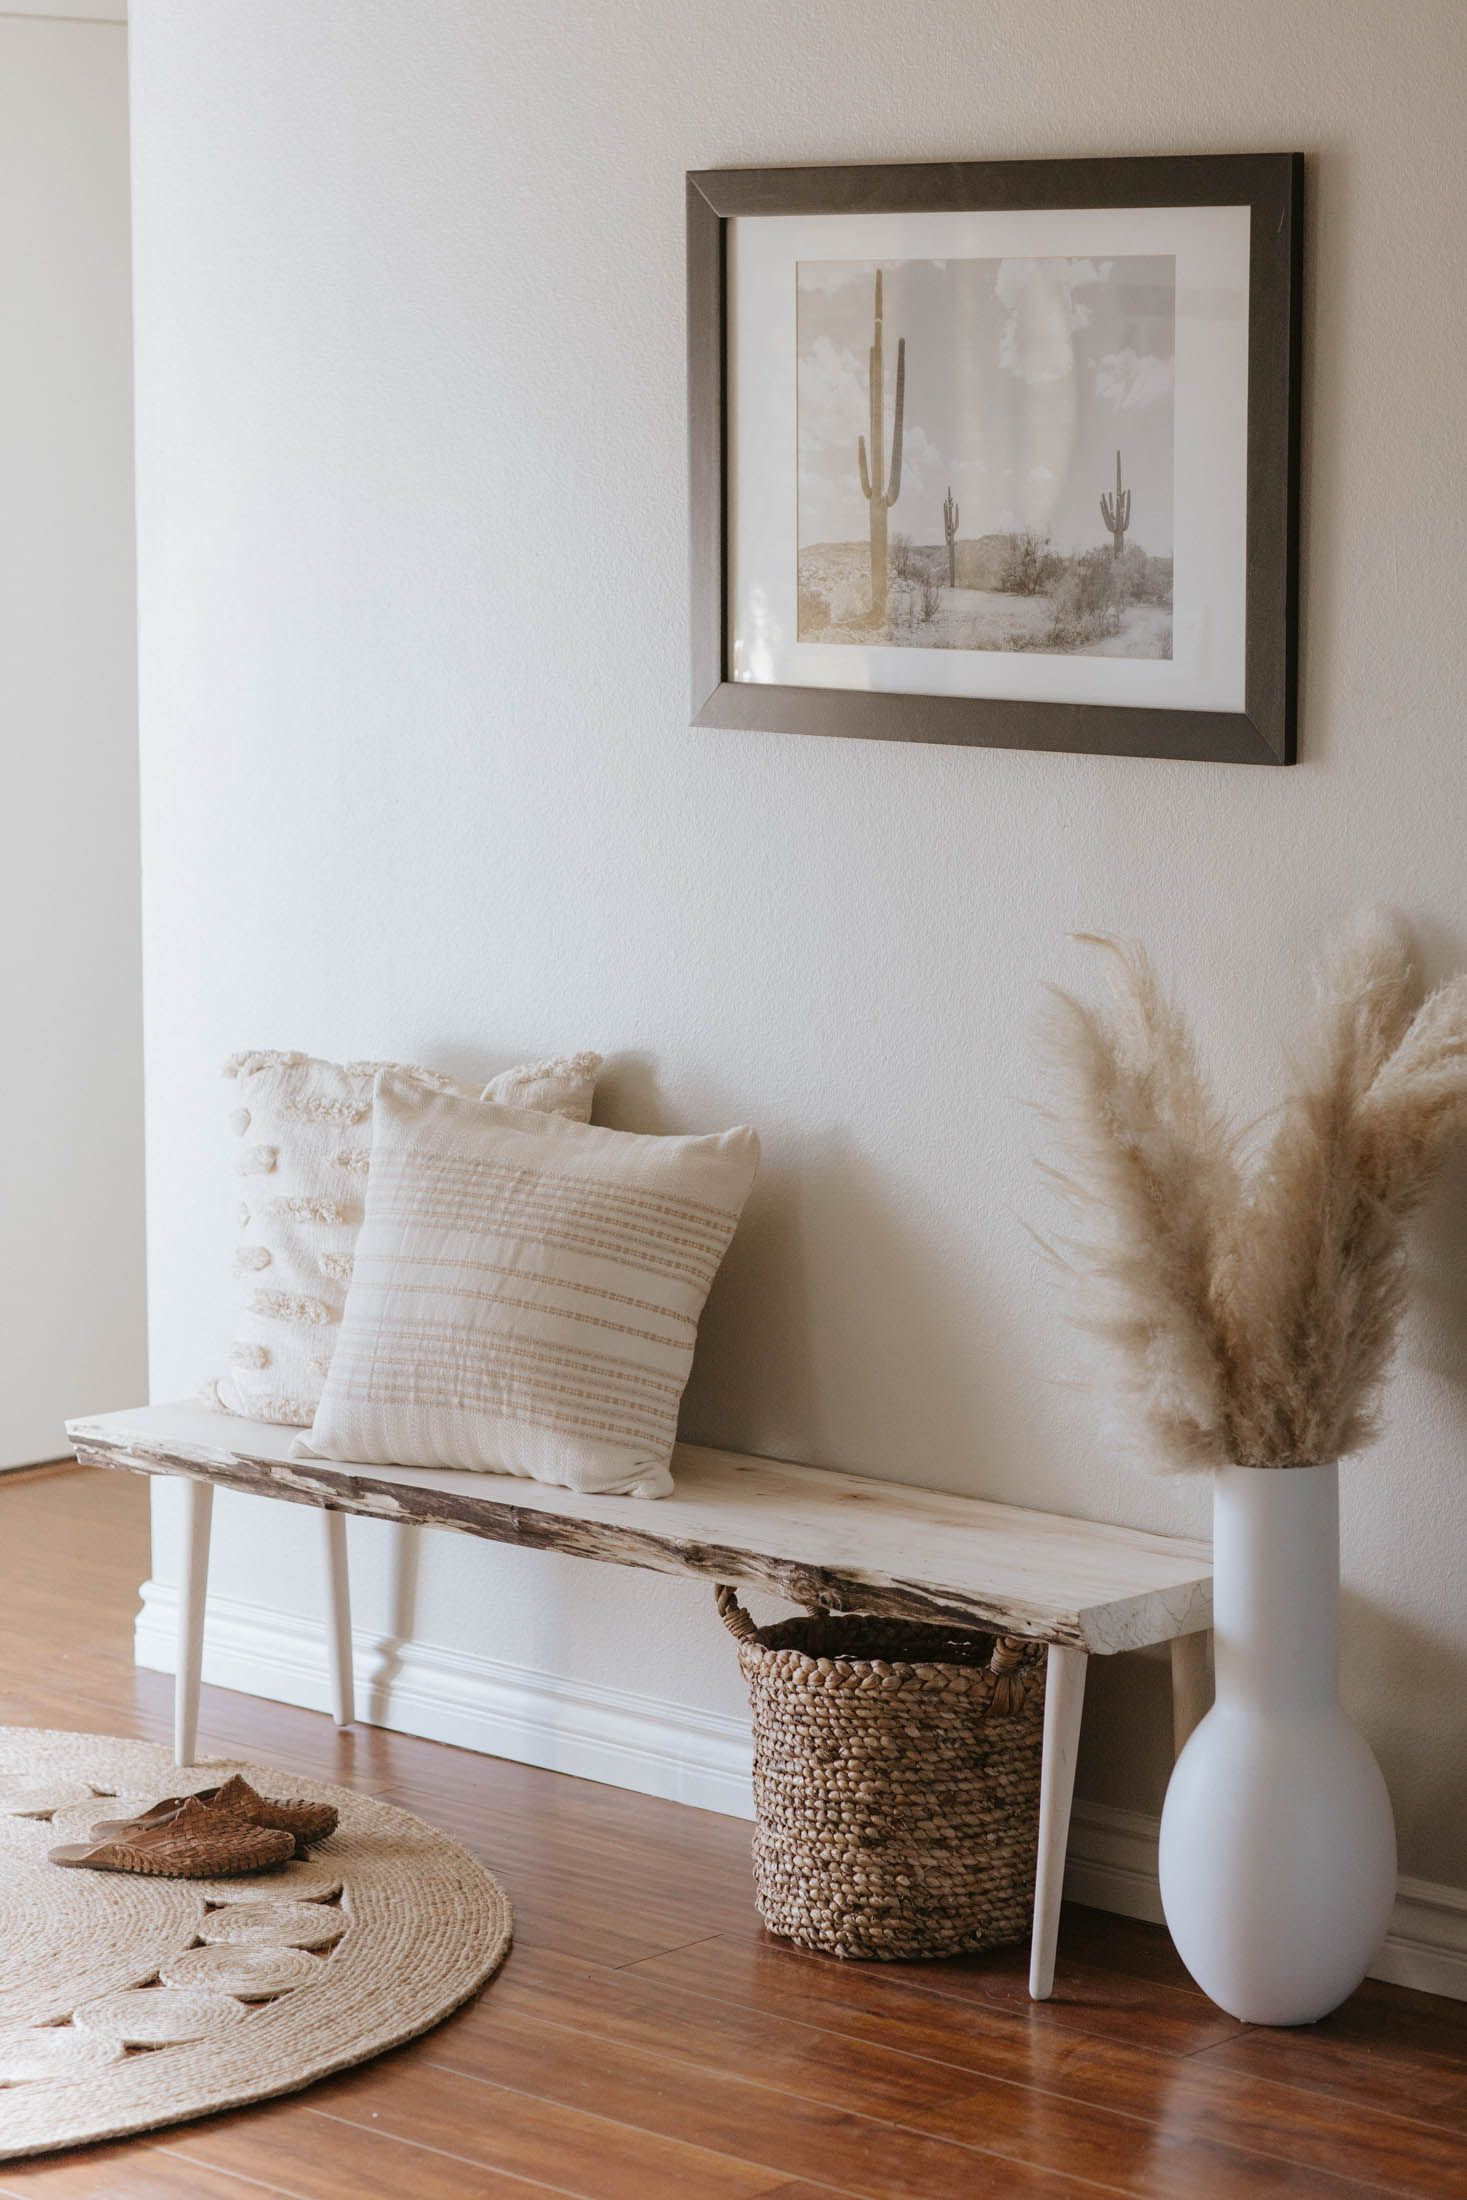 Modern Live Edge Bleached Maple Entry Bench, Living Room Decor Inspiration